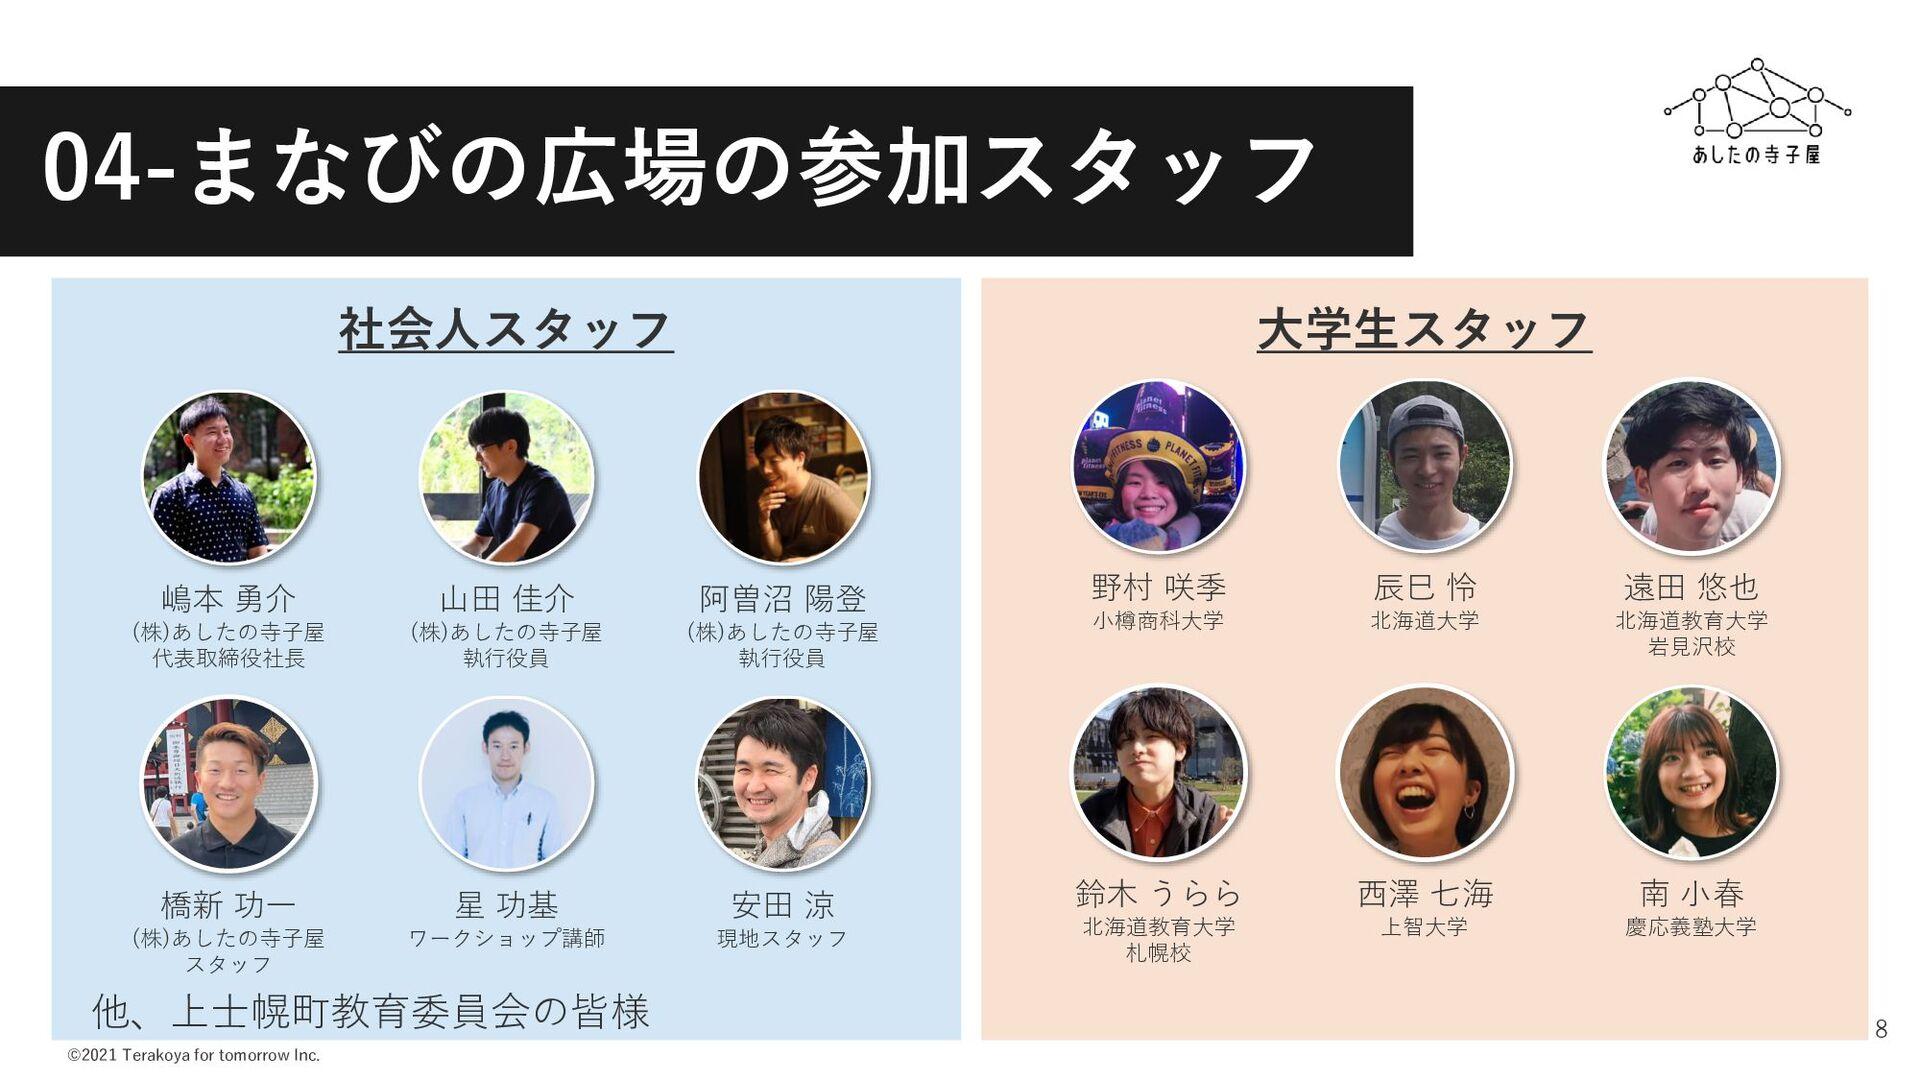 ©2021 Terakoya for tomorrow Inc. 大学生スタッフ 社会人スタッ...